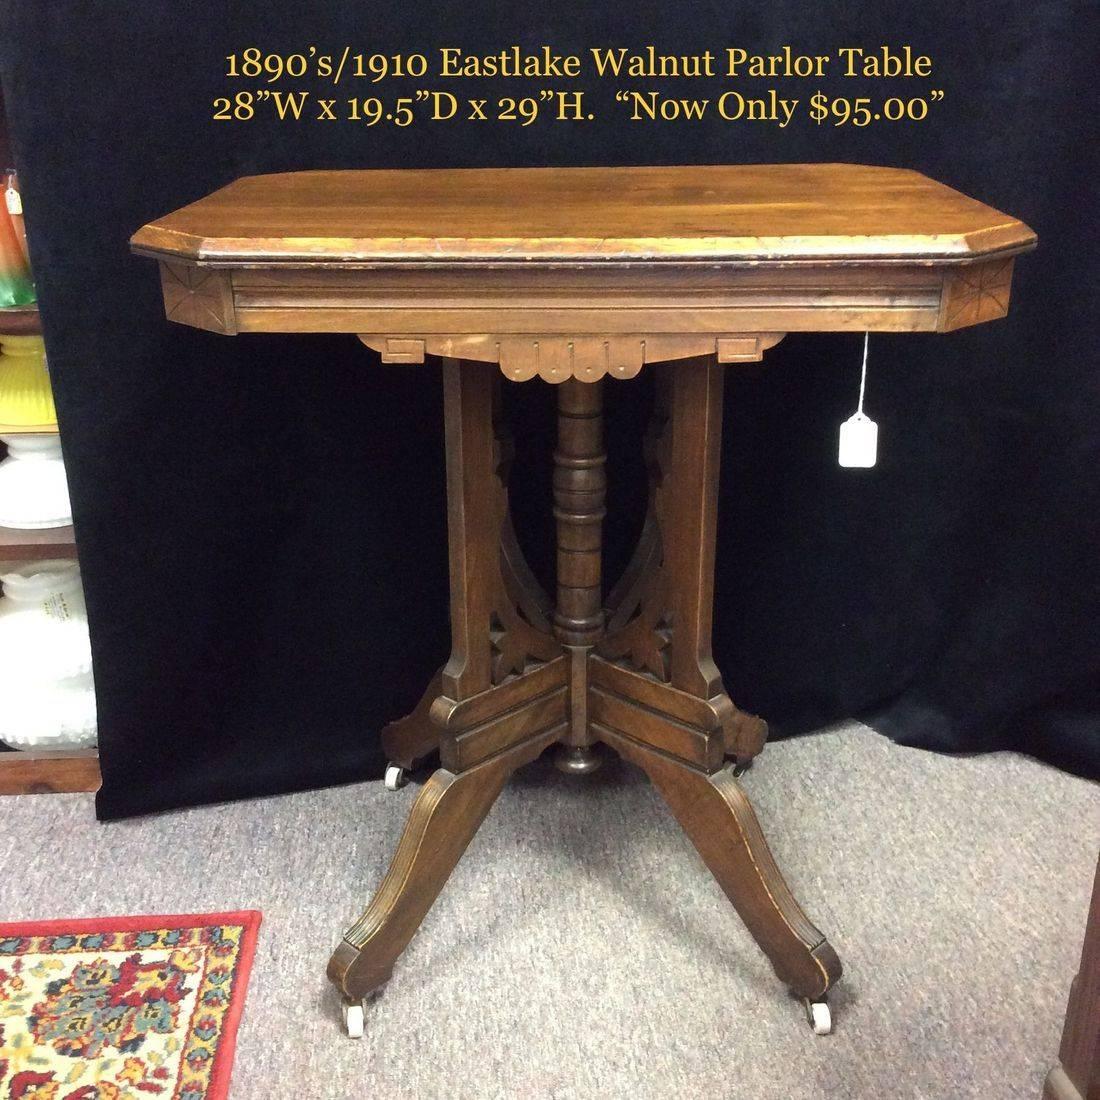 1890's/1910 East Lake, Walnut Parlor Table w/Porcelain Wheels   $95.00